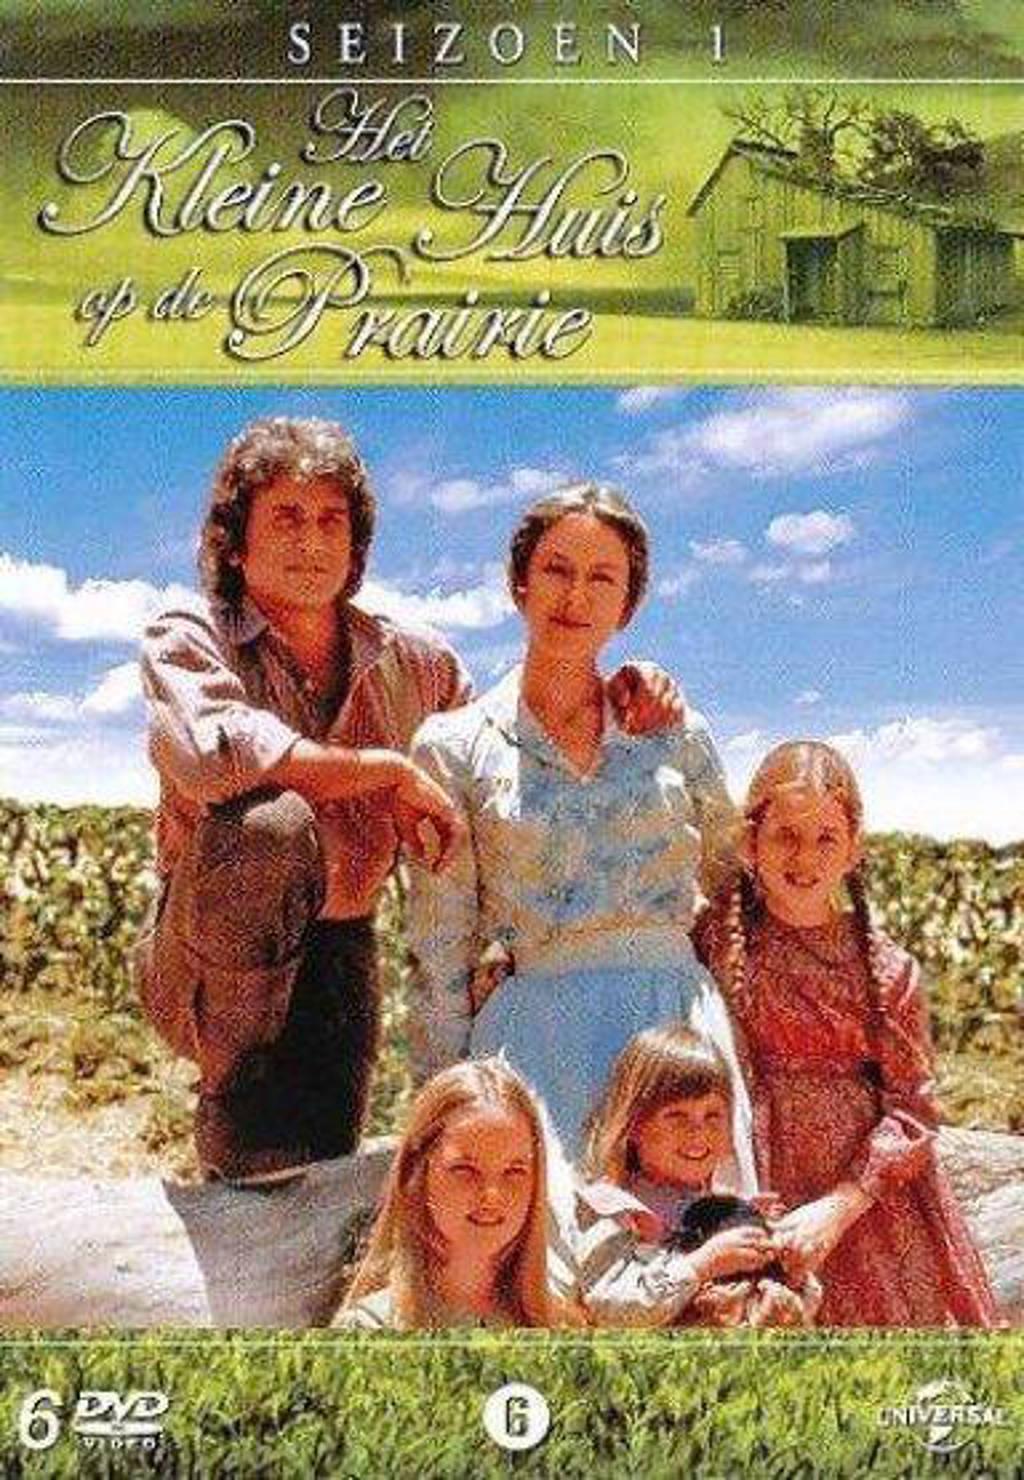 Kleine huis op de prairie - Seizoen 1 (DVD)